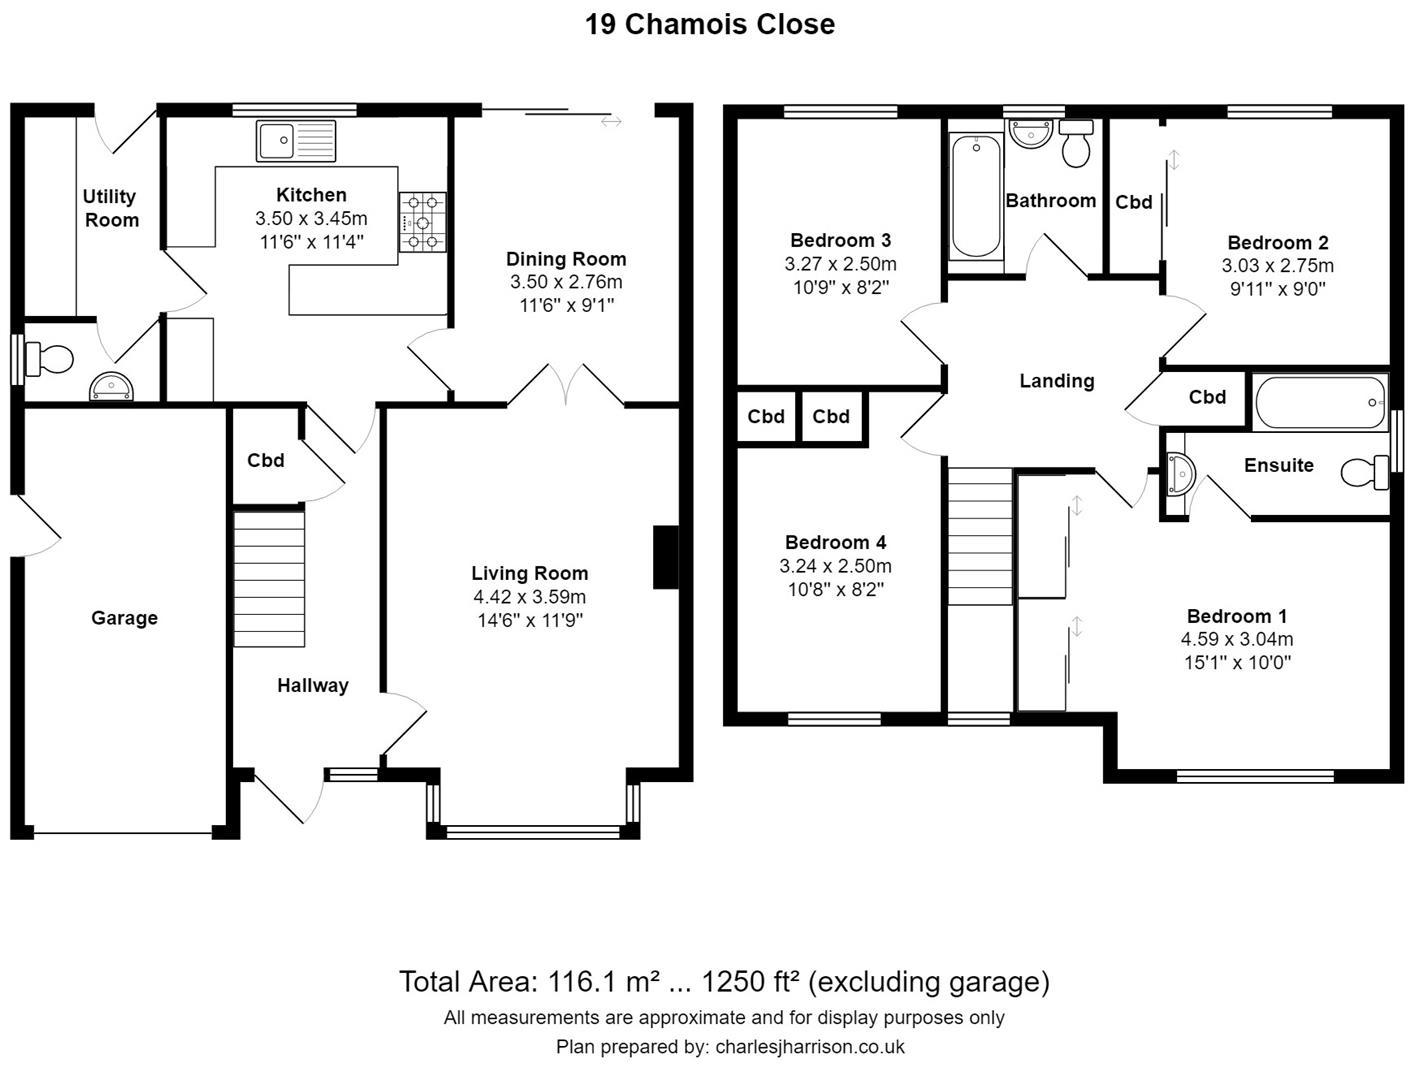 Floor plan Chamois Close, Sawston, Cambridge